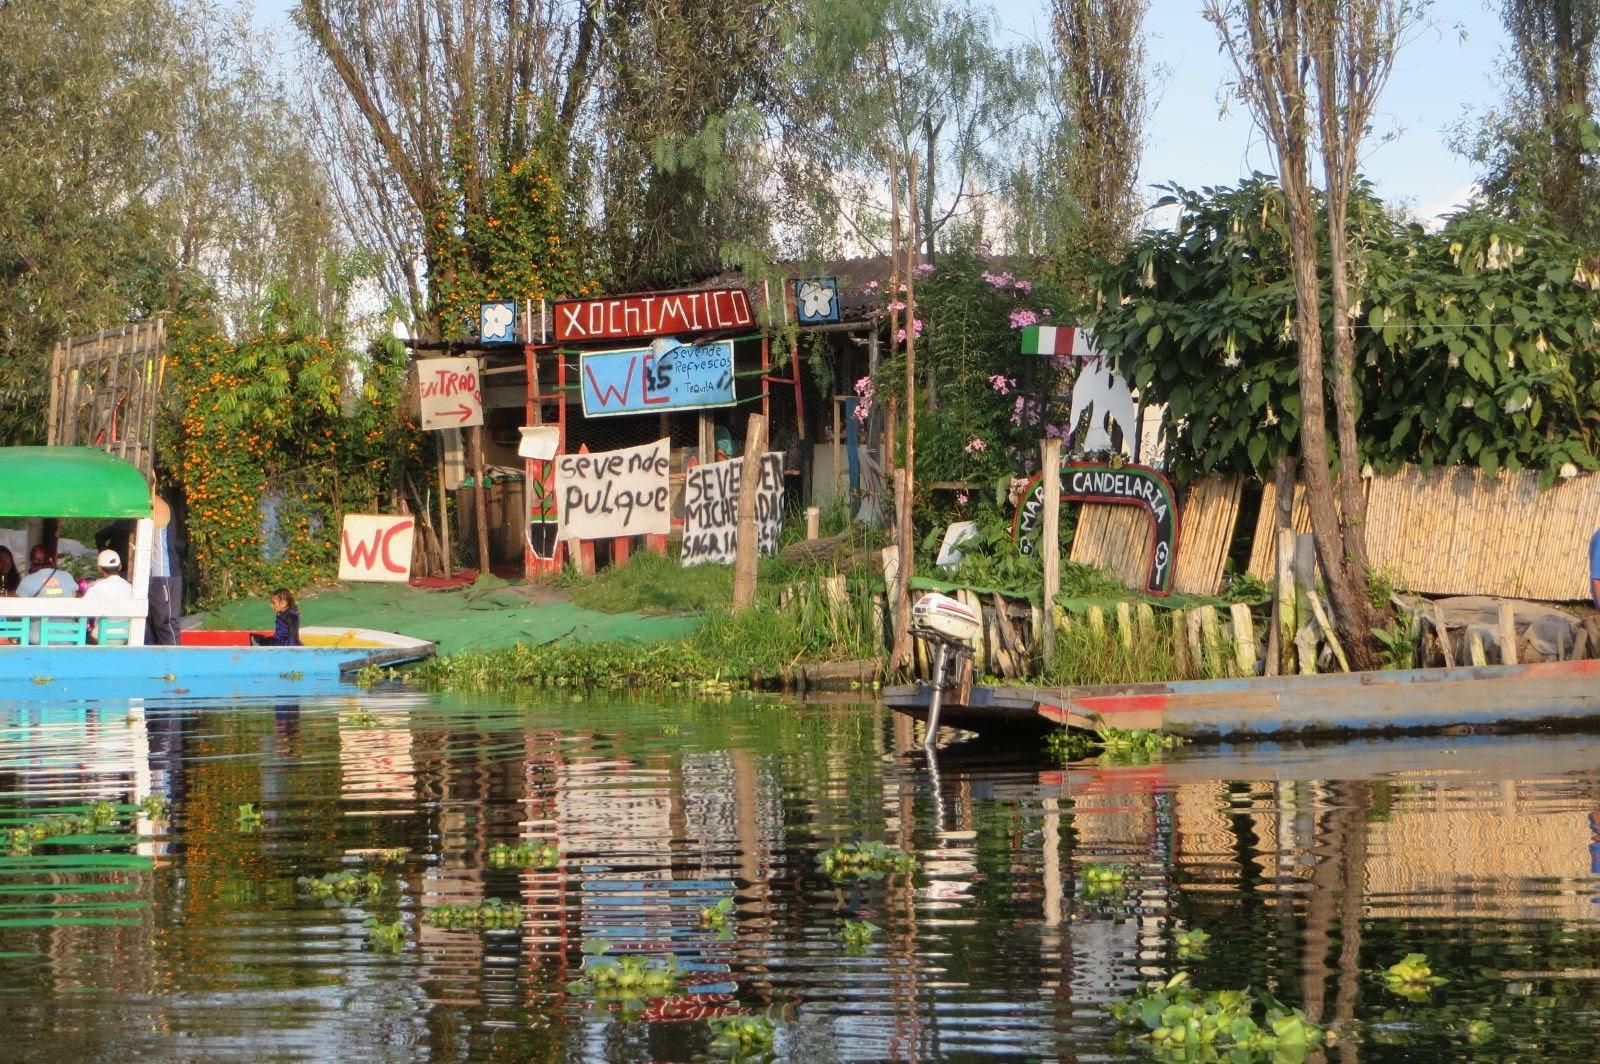 xochimilco_roadside.jpg